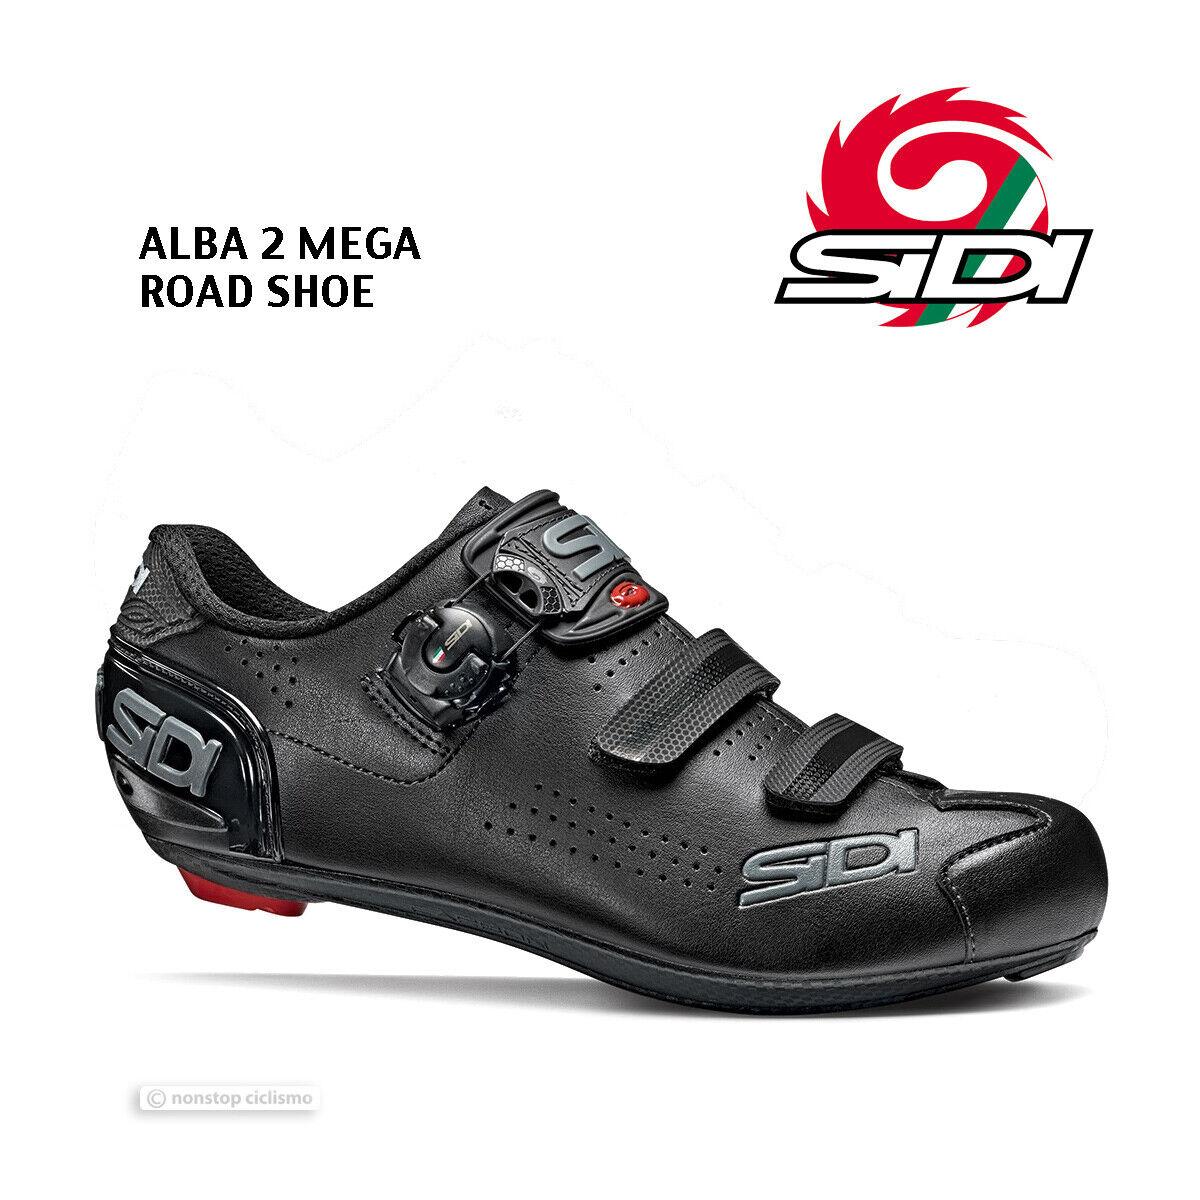 NEW 2020 Sidi ALBA 2 MEGA Road Cycling schuhe   schwarz schwarz